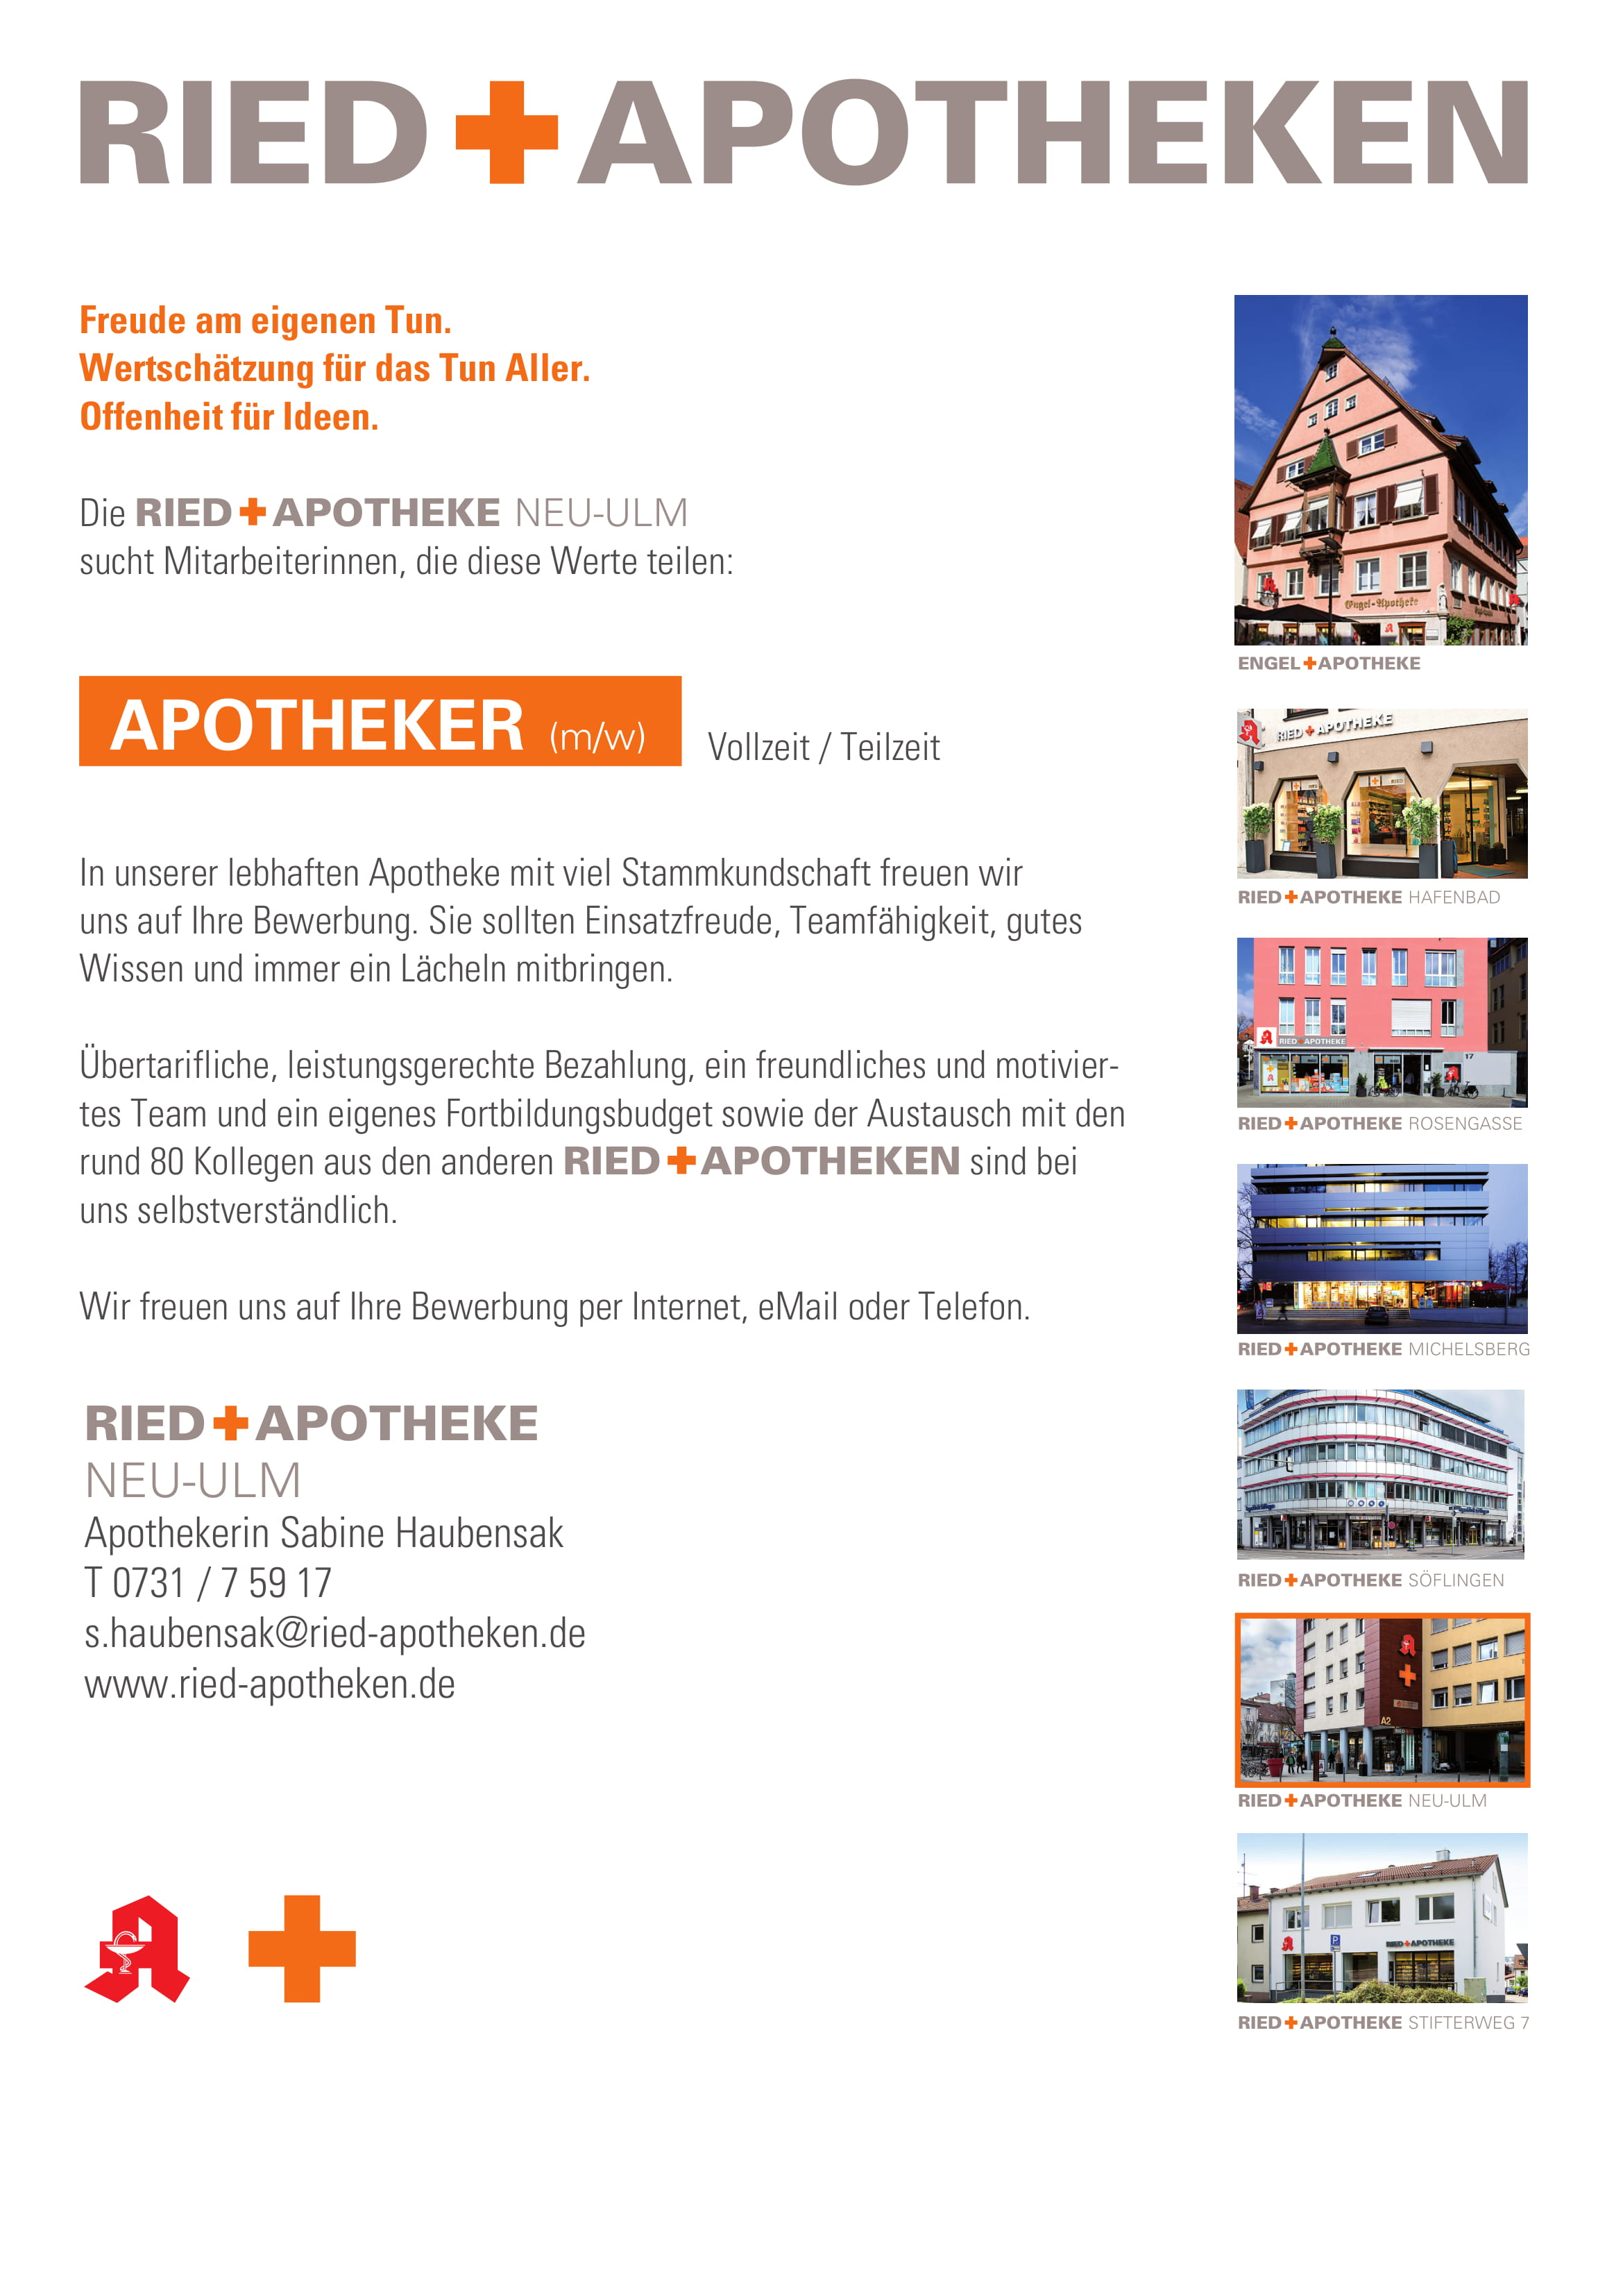 APOTHEKER/IN in der RIED + APOTHEKE NEU-ULM